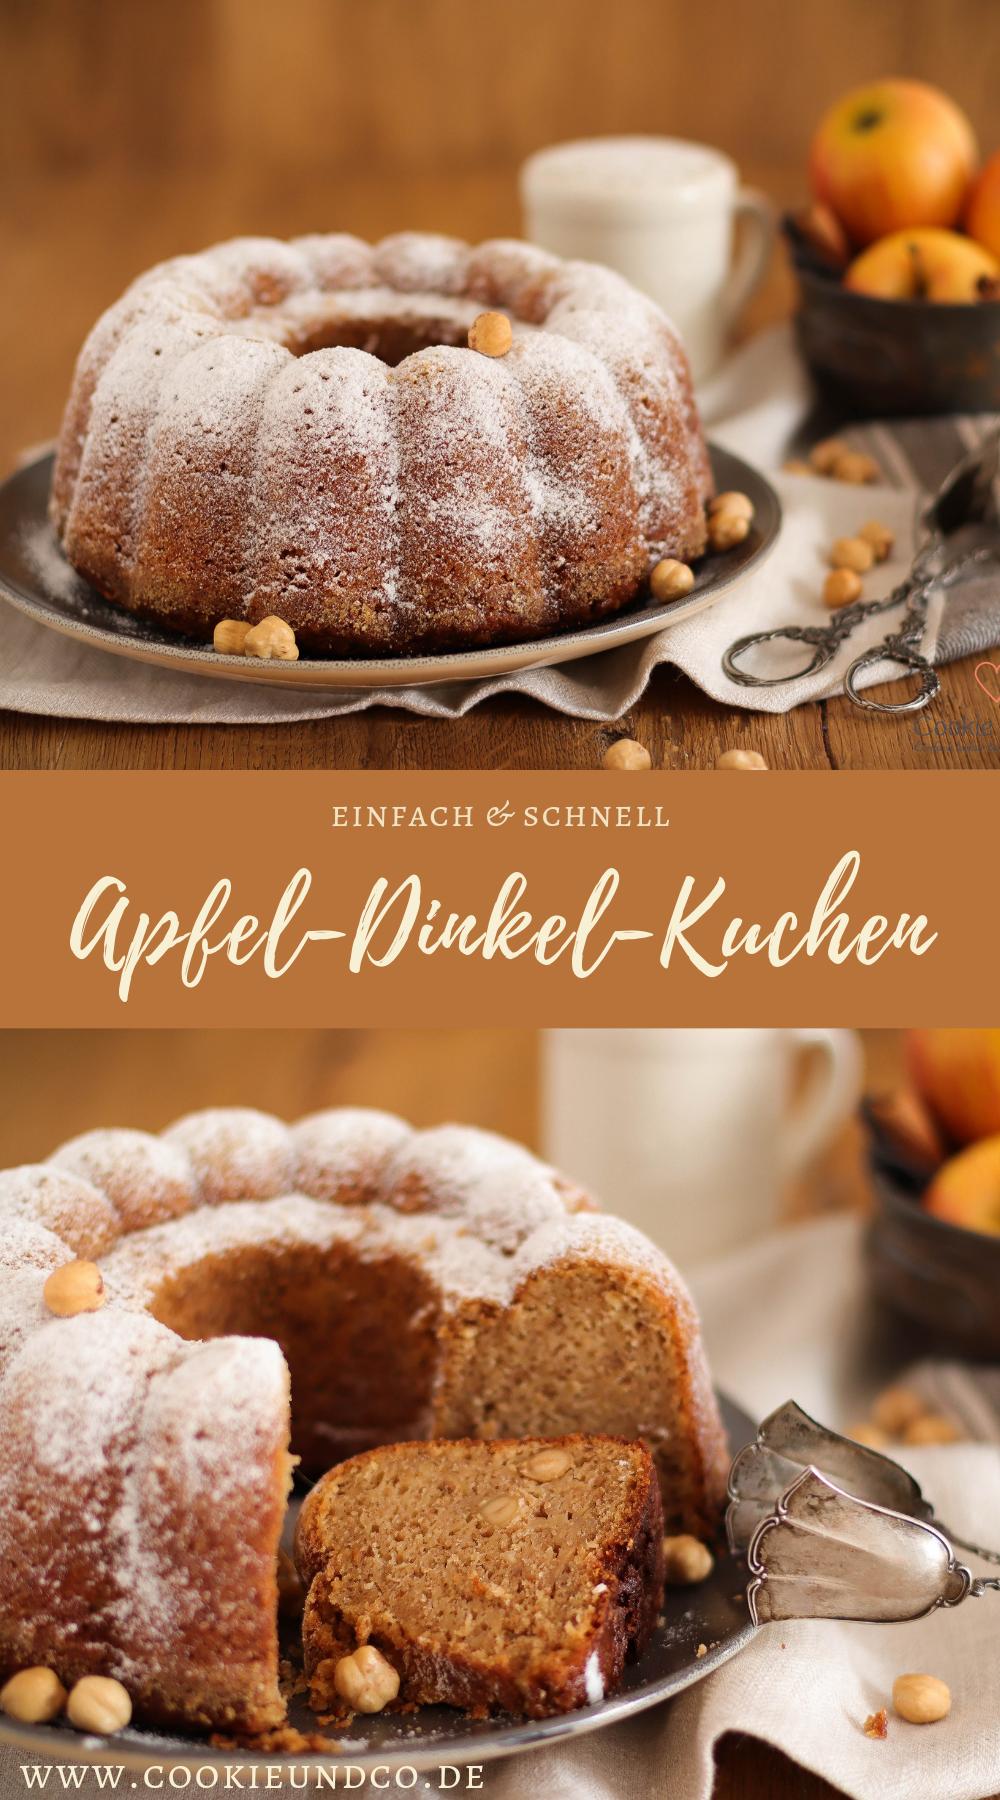 Apfel Dinkel Kuchen Familienrezept Kochen Pinterest